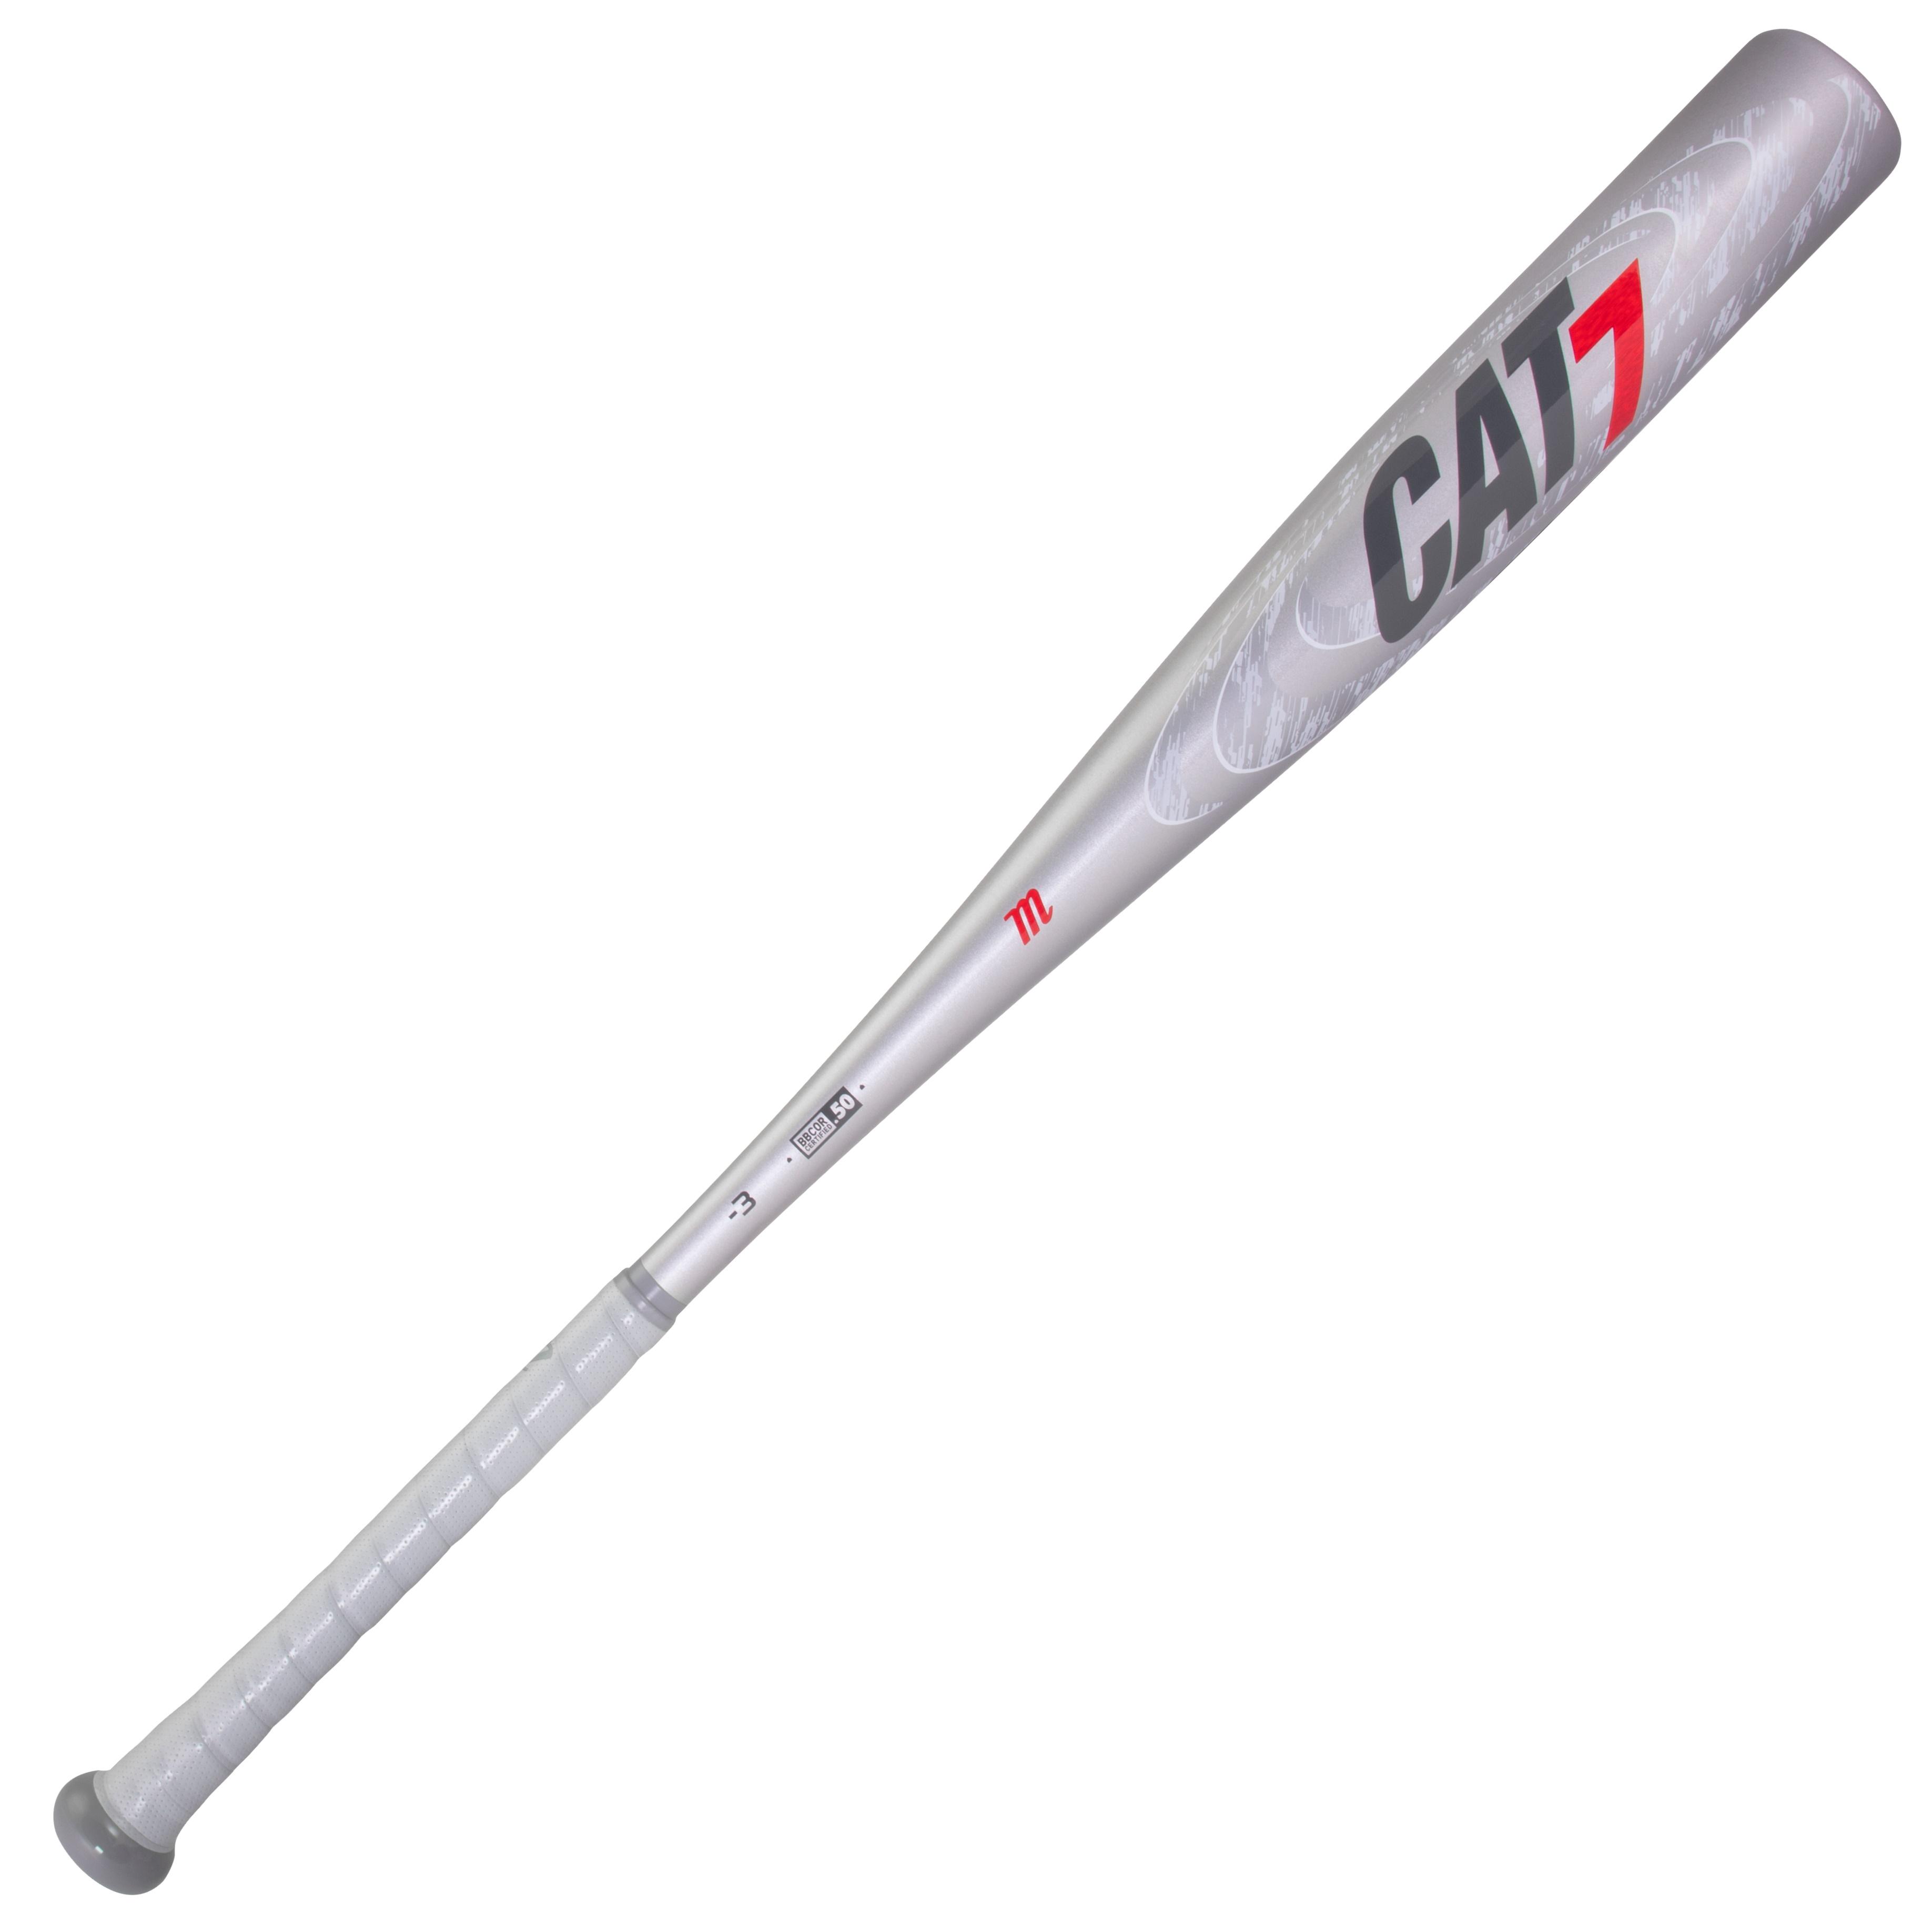 marucci-cat7-silver-3-bbcor-baseball-bat-33-inch-30-oz MCBC72S-3330